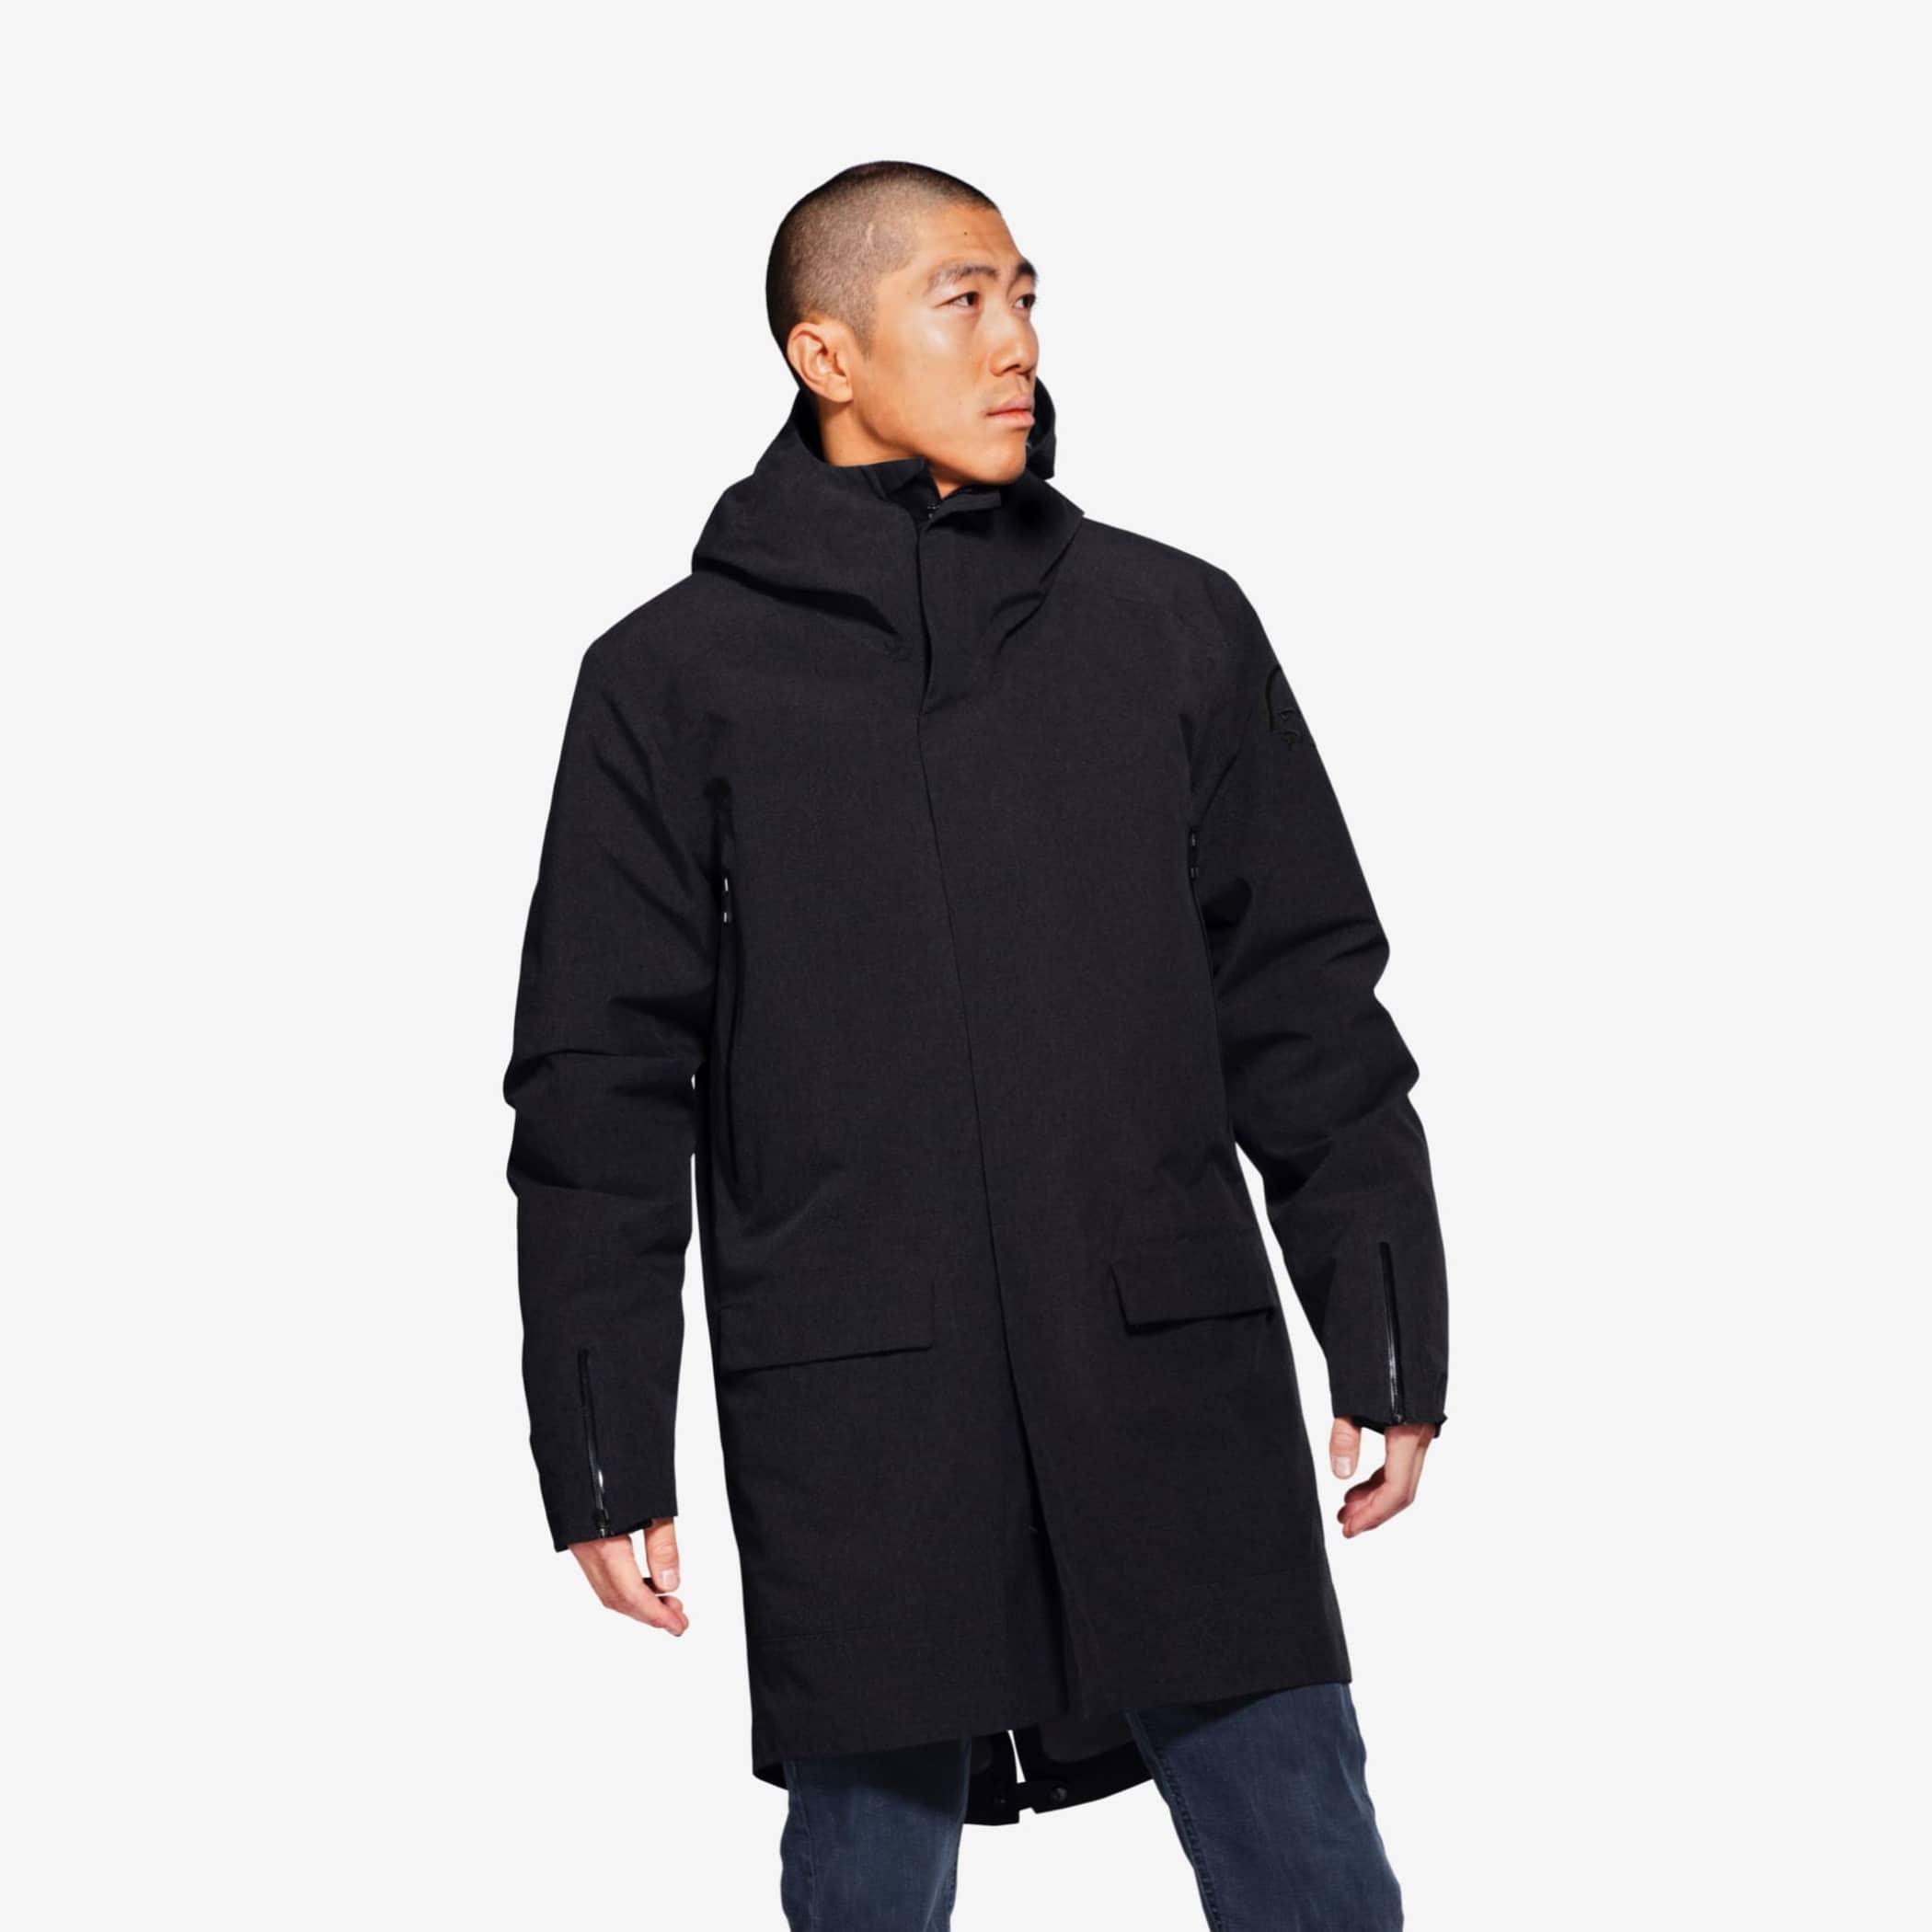 Sleeve, Black, Parka, Coat, Hood, Outerwear, Jacket, Clothing